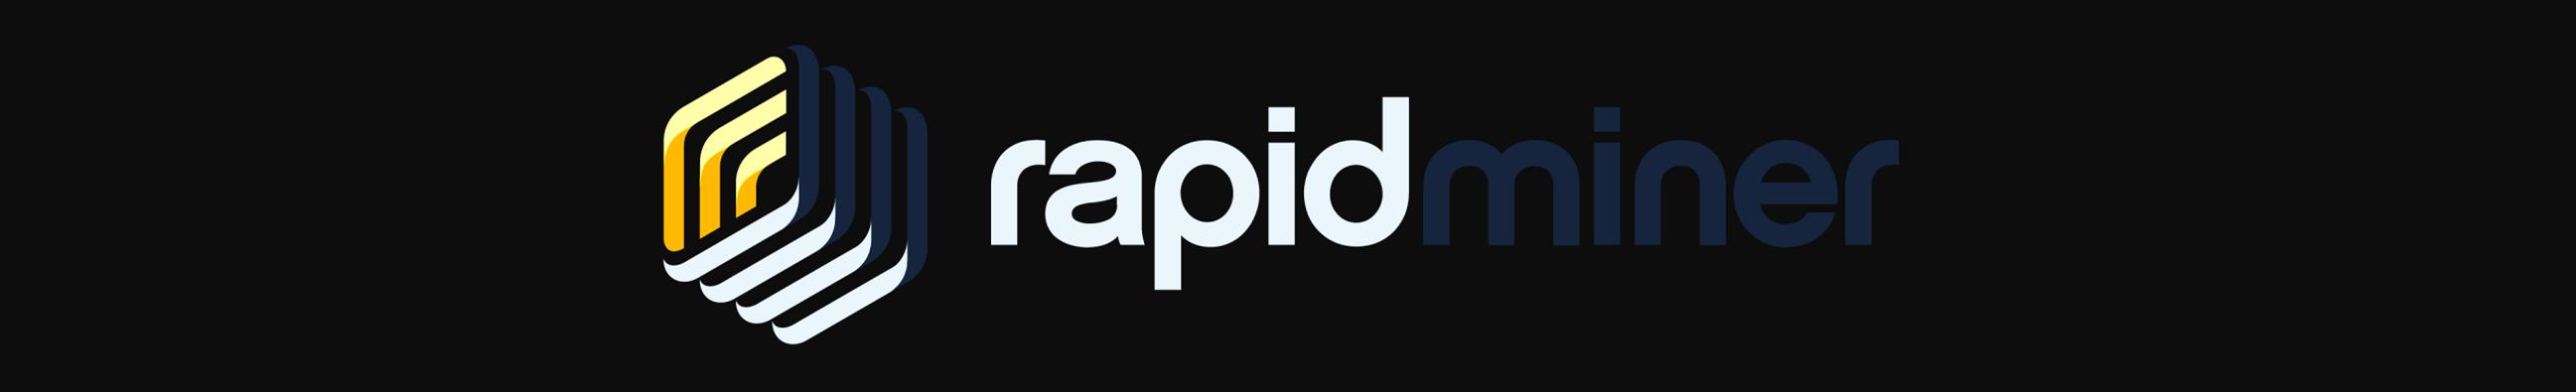 RapidMiner Logo - Top 10 Data Analytics Tools - Edureka